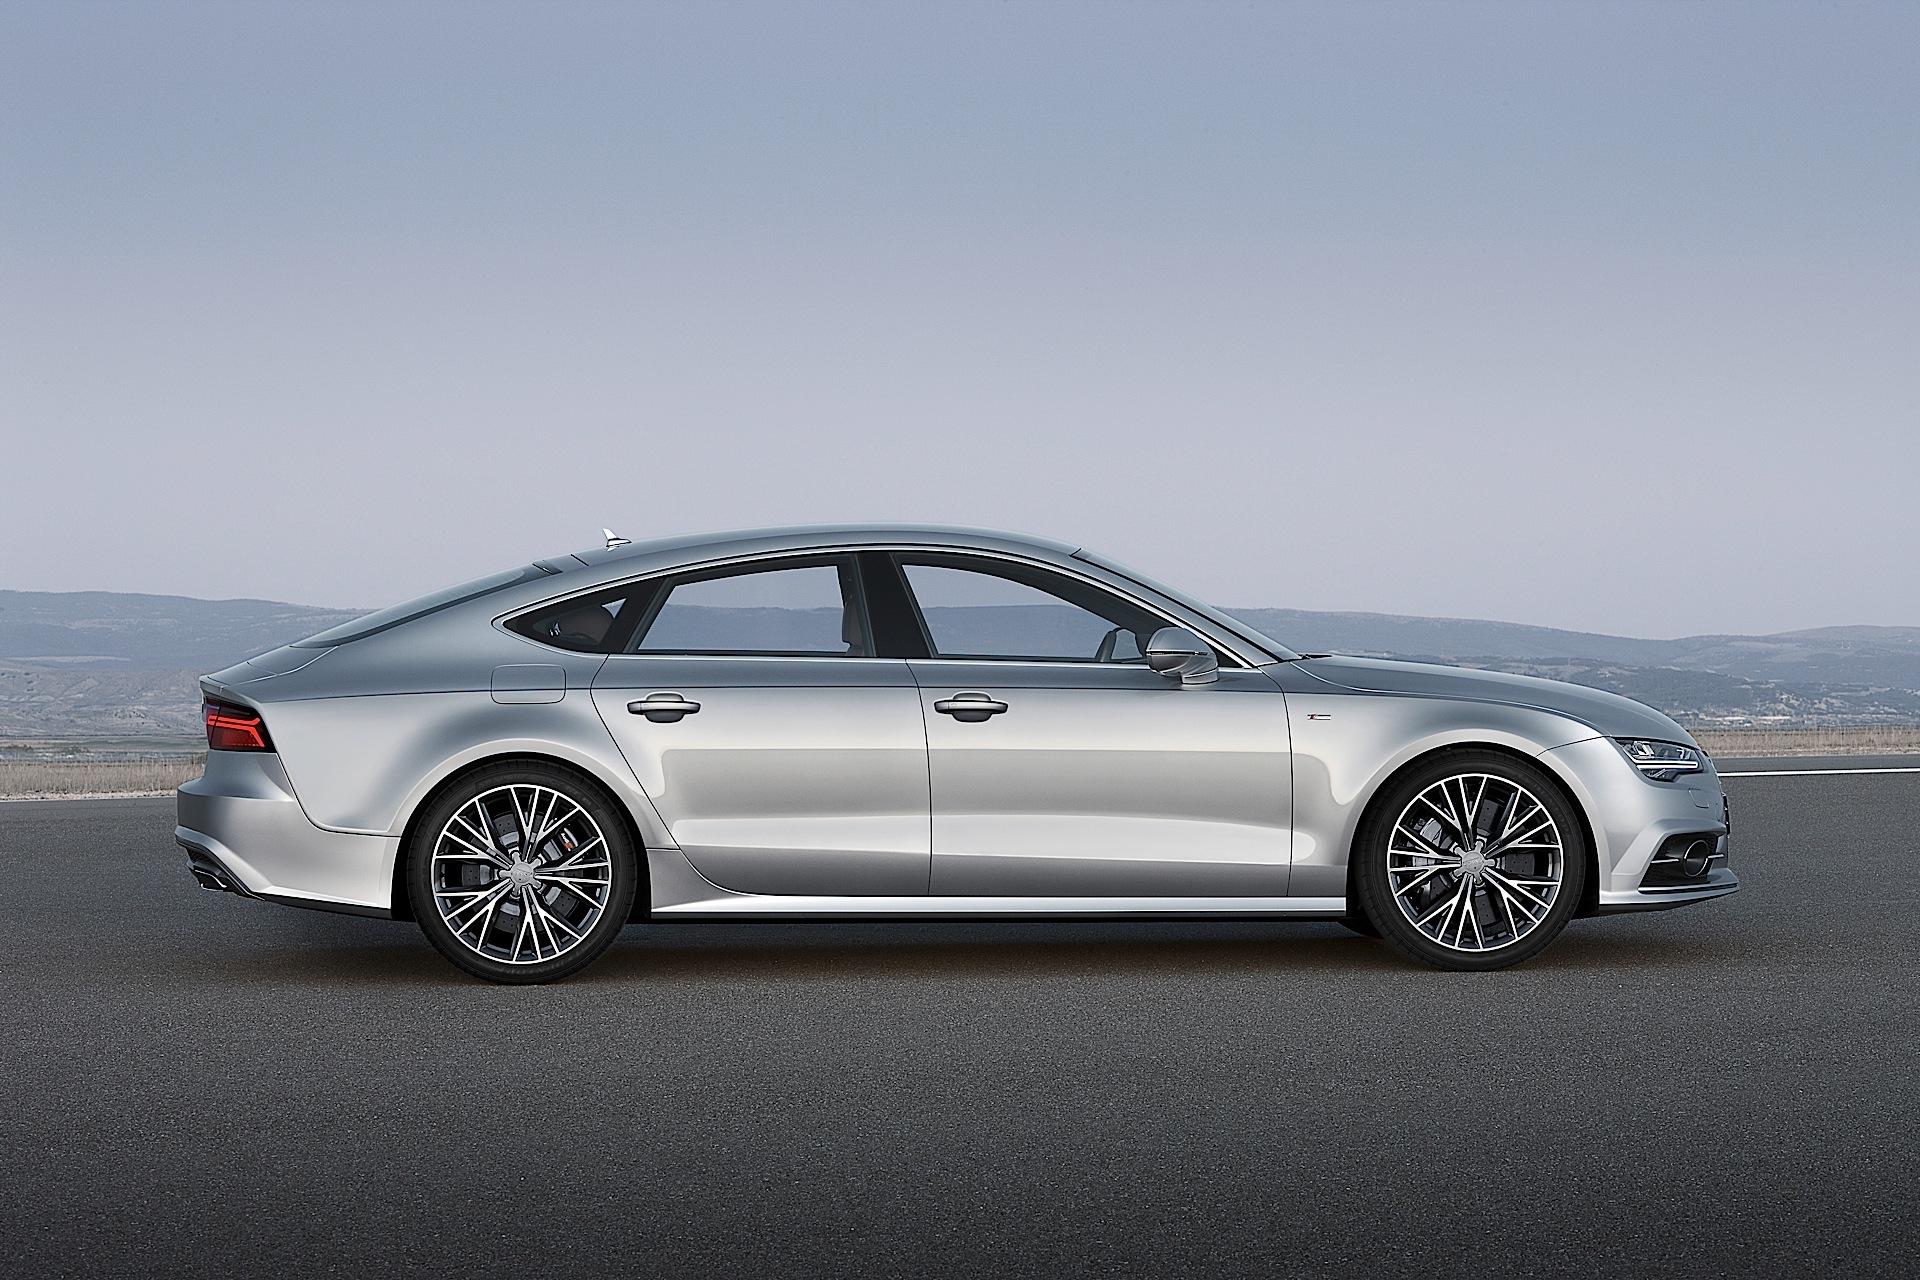 Kelebihan Audi S7 2017 Murah Berkualitas